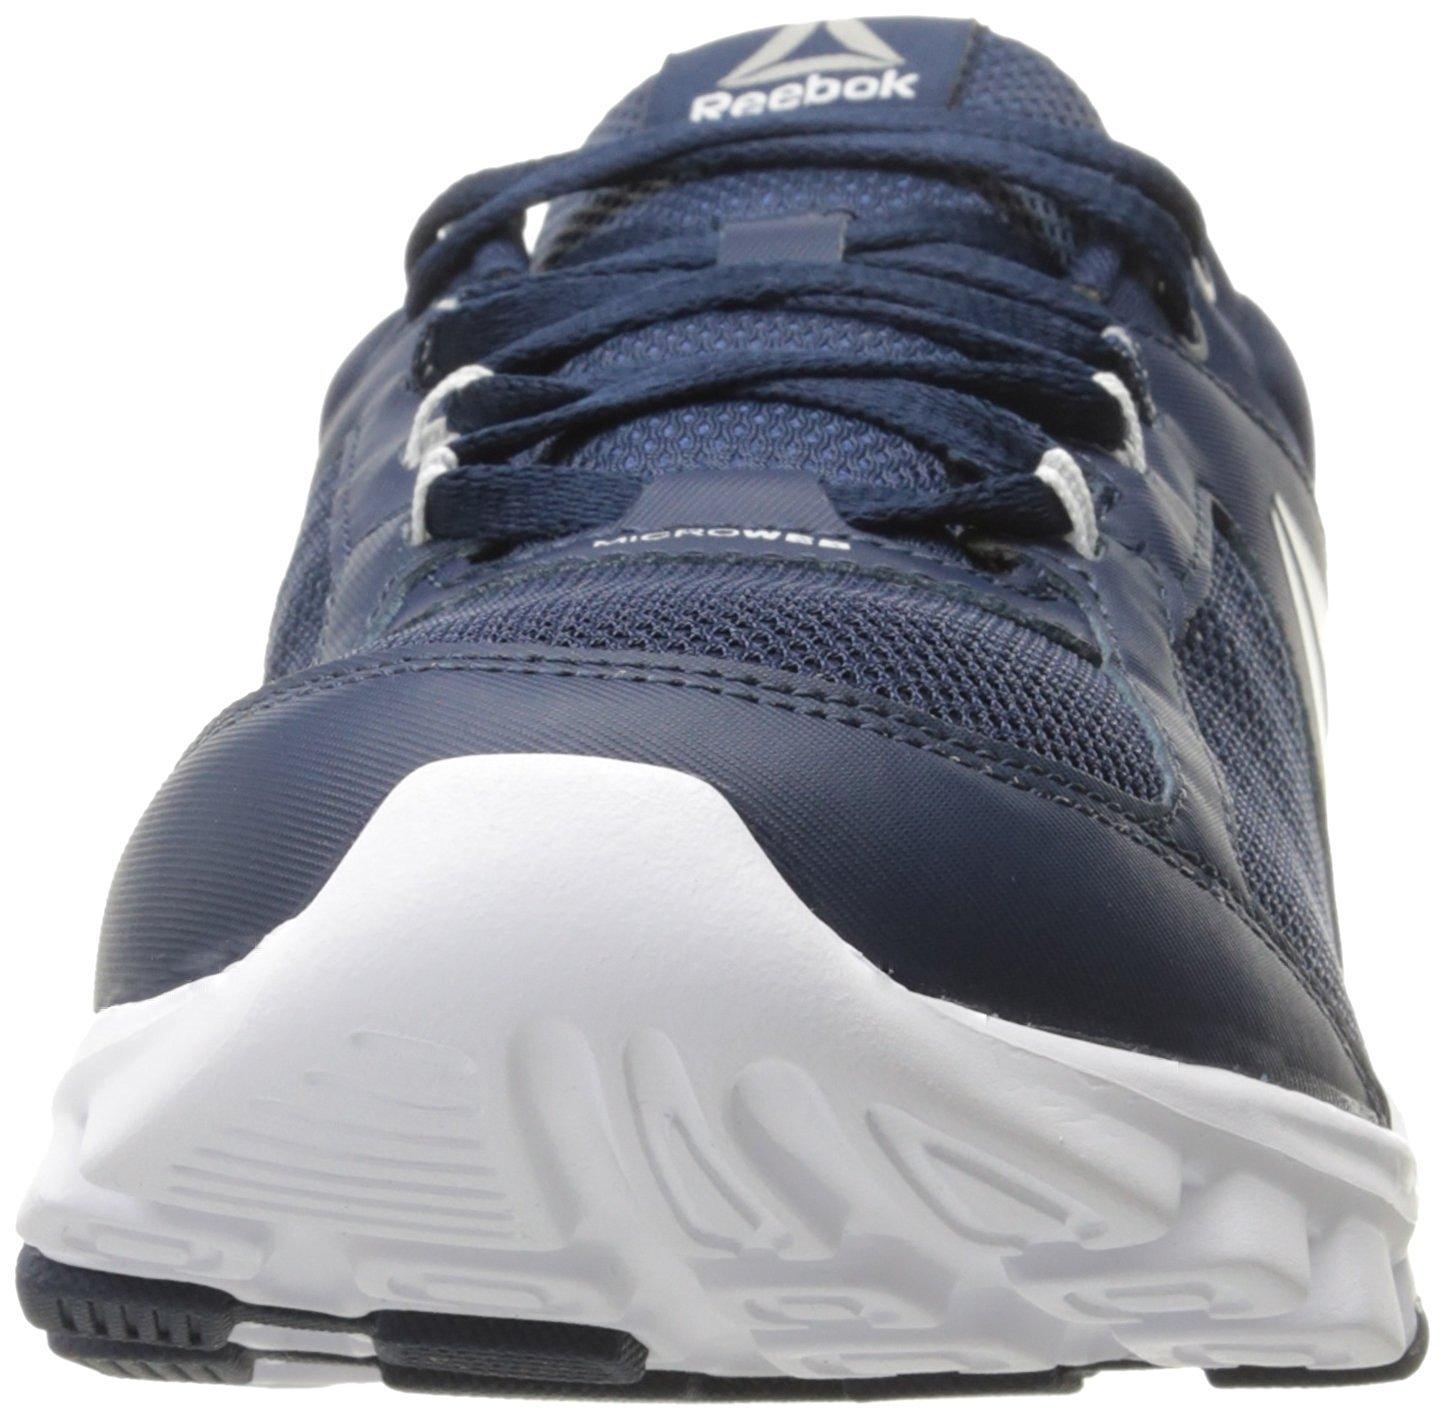 ca805c6eb85 Reebok Men s Yourflex Train 9.0 MT Cross-Trainer Shoe